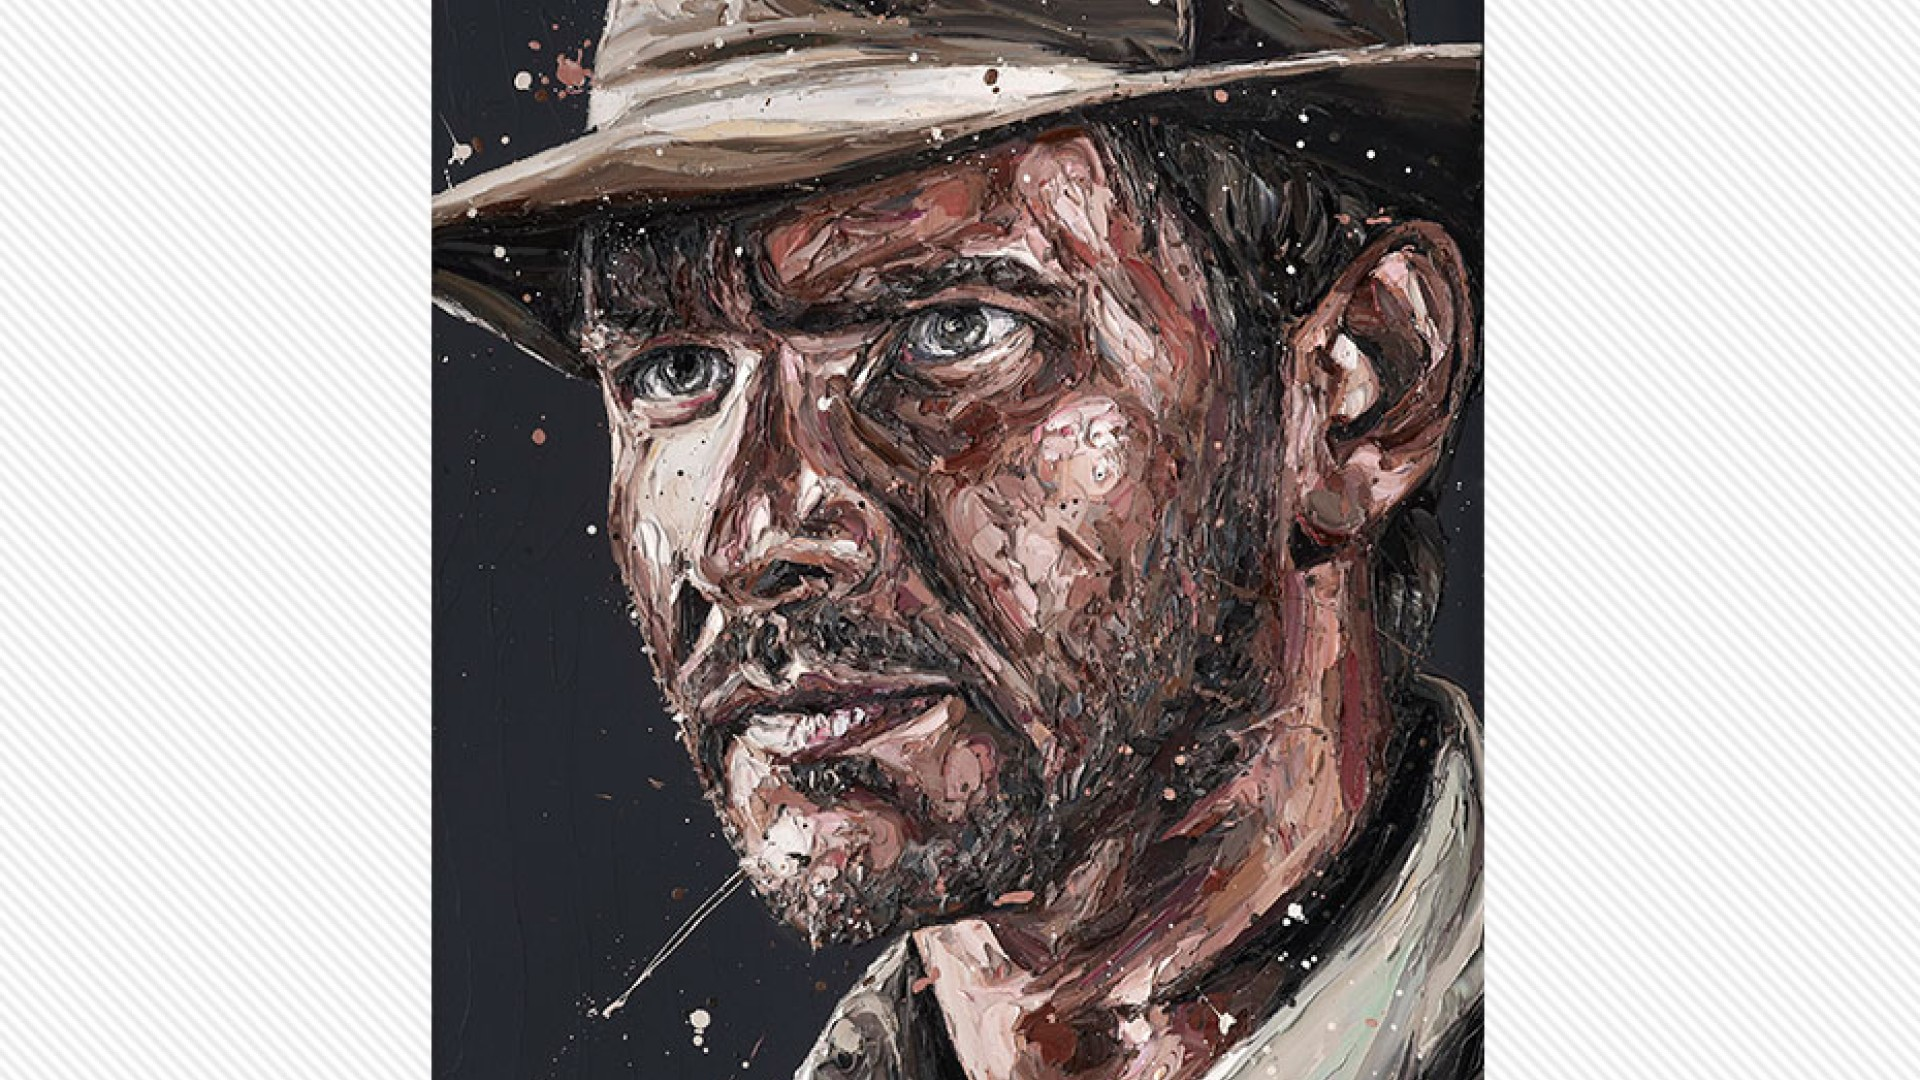 Indiana Jones by Paul Oz